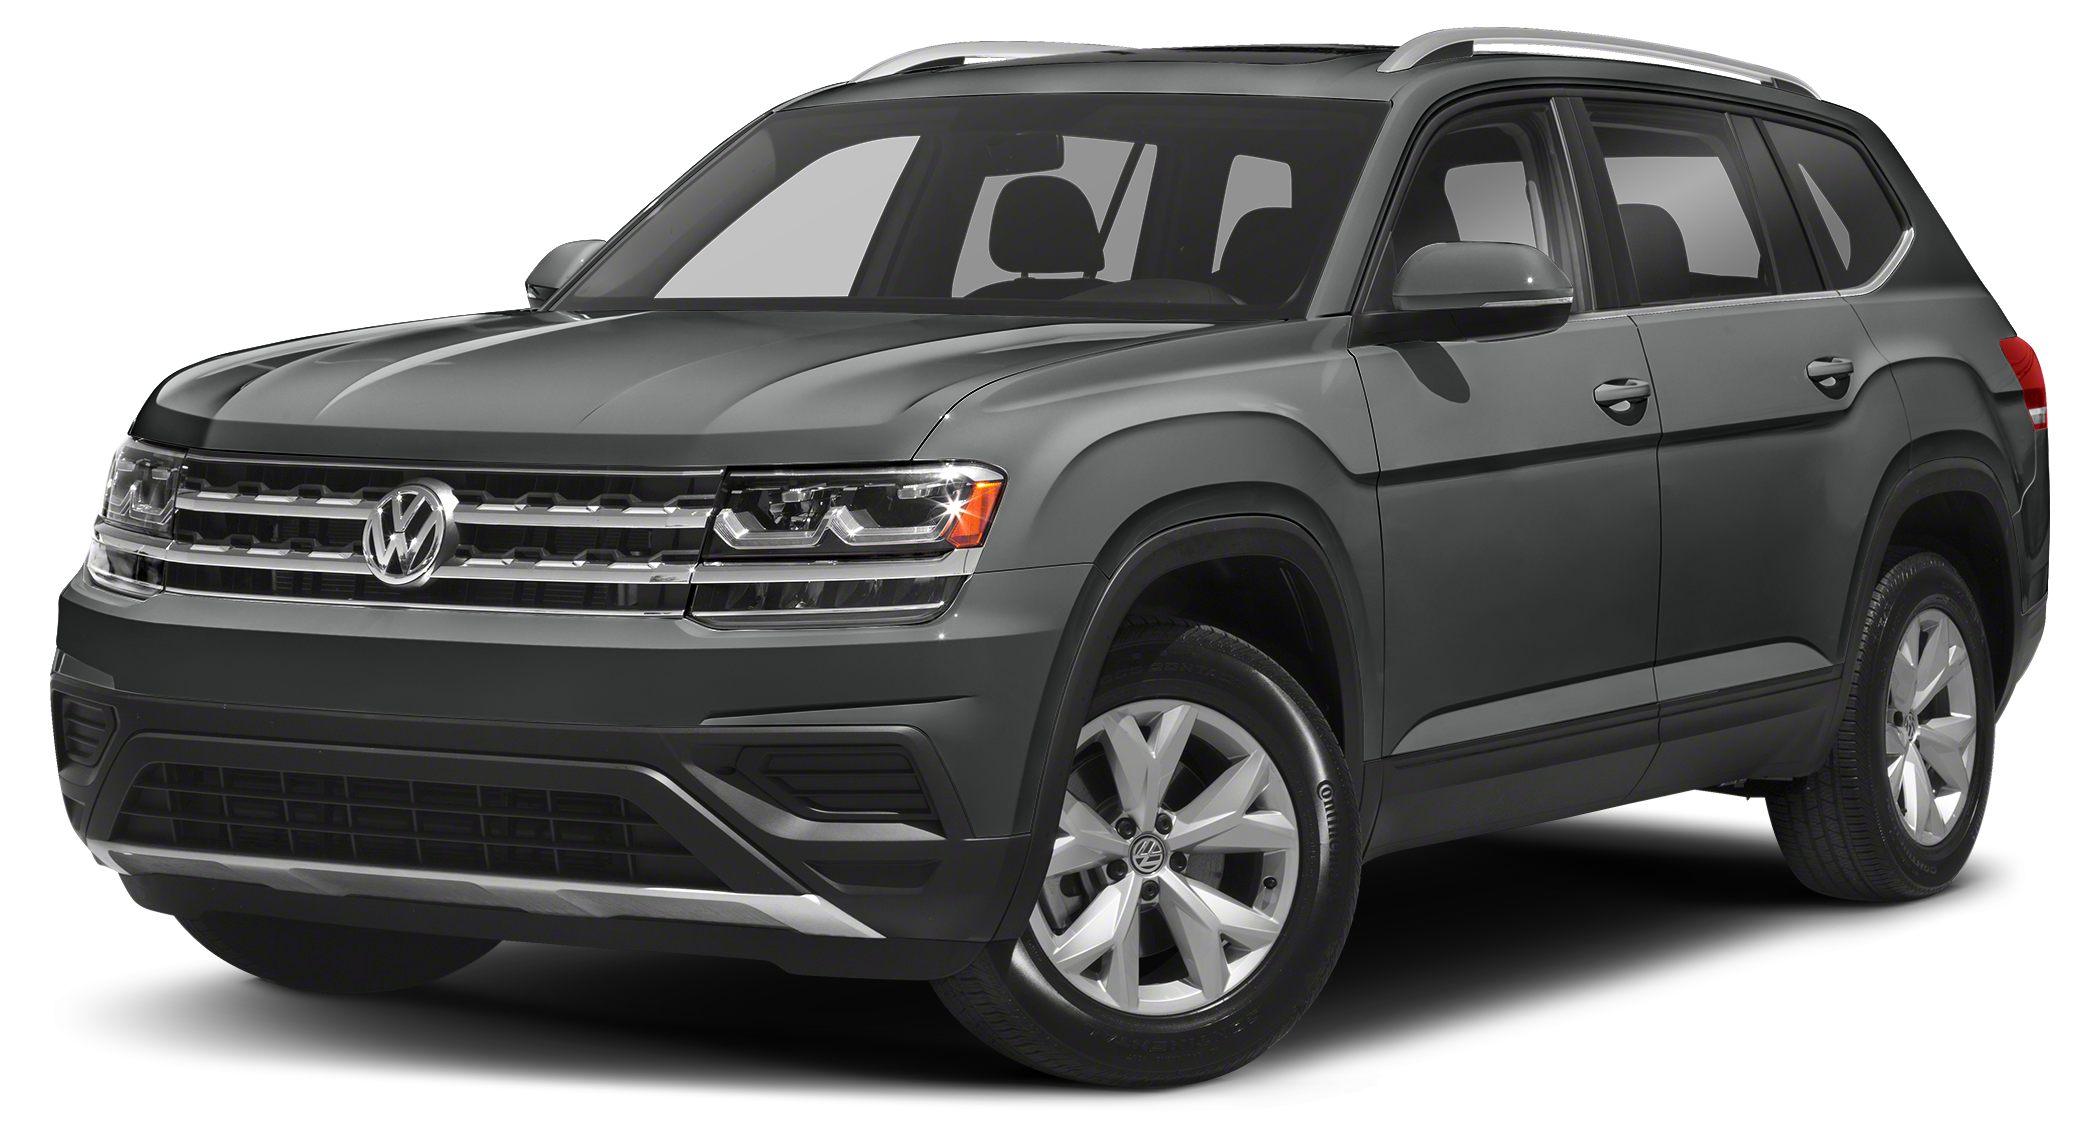 2018 Volkswagen Atlas 36 SEL Premium Great MPG 23 MPG Hwy All Wheel Drive New Inventory S